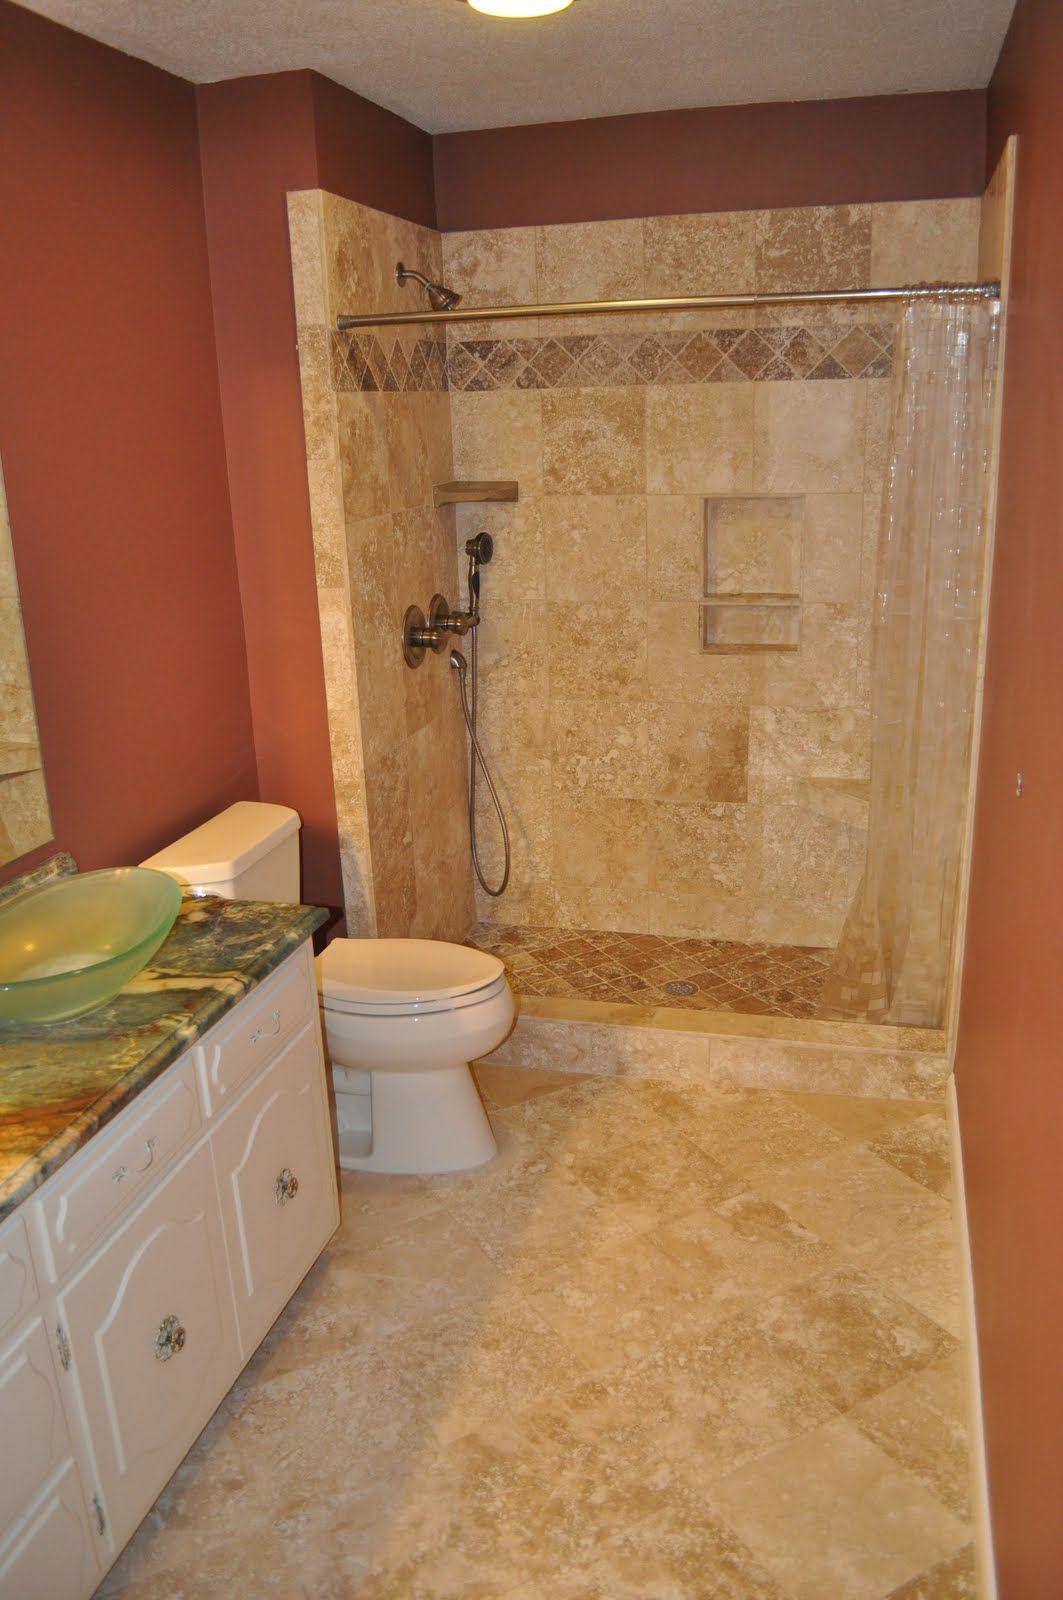 Bathroom remodel ideas google search bathroom remodel for Google bathroom ideas